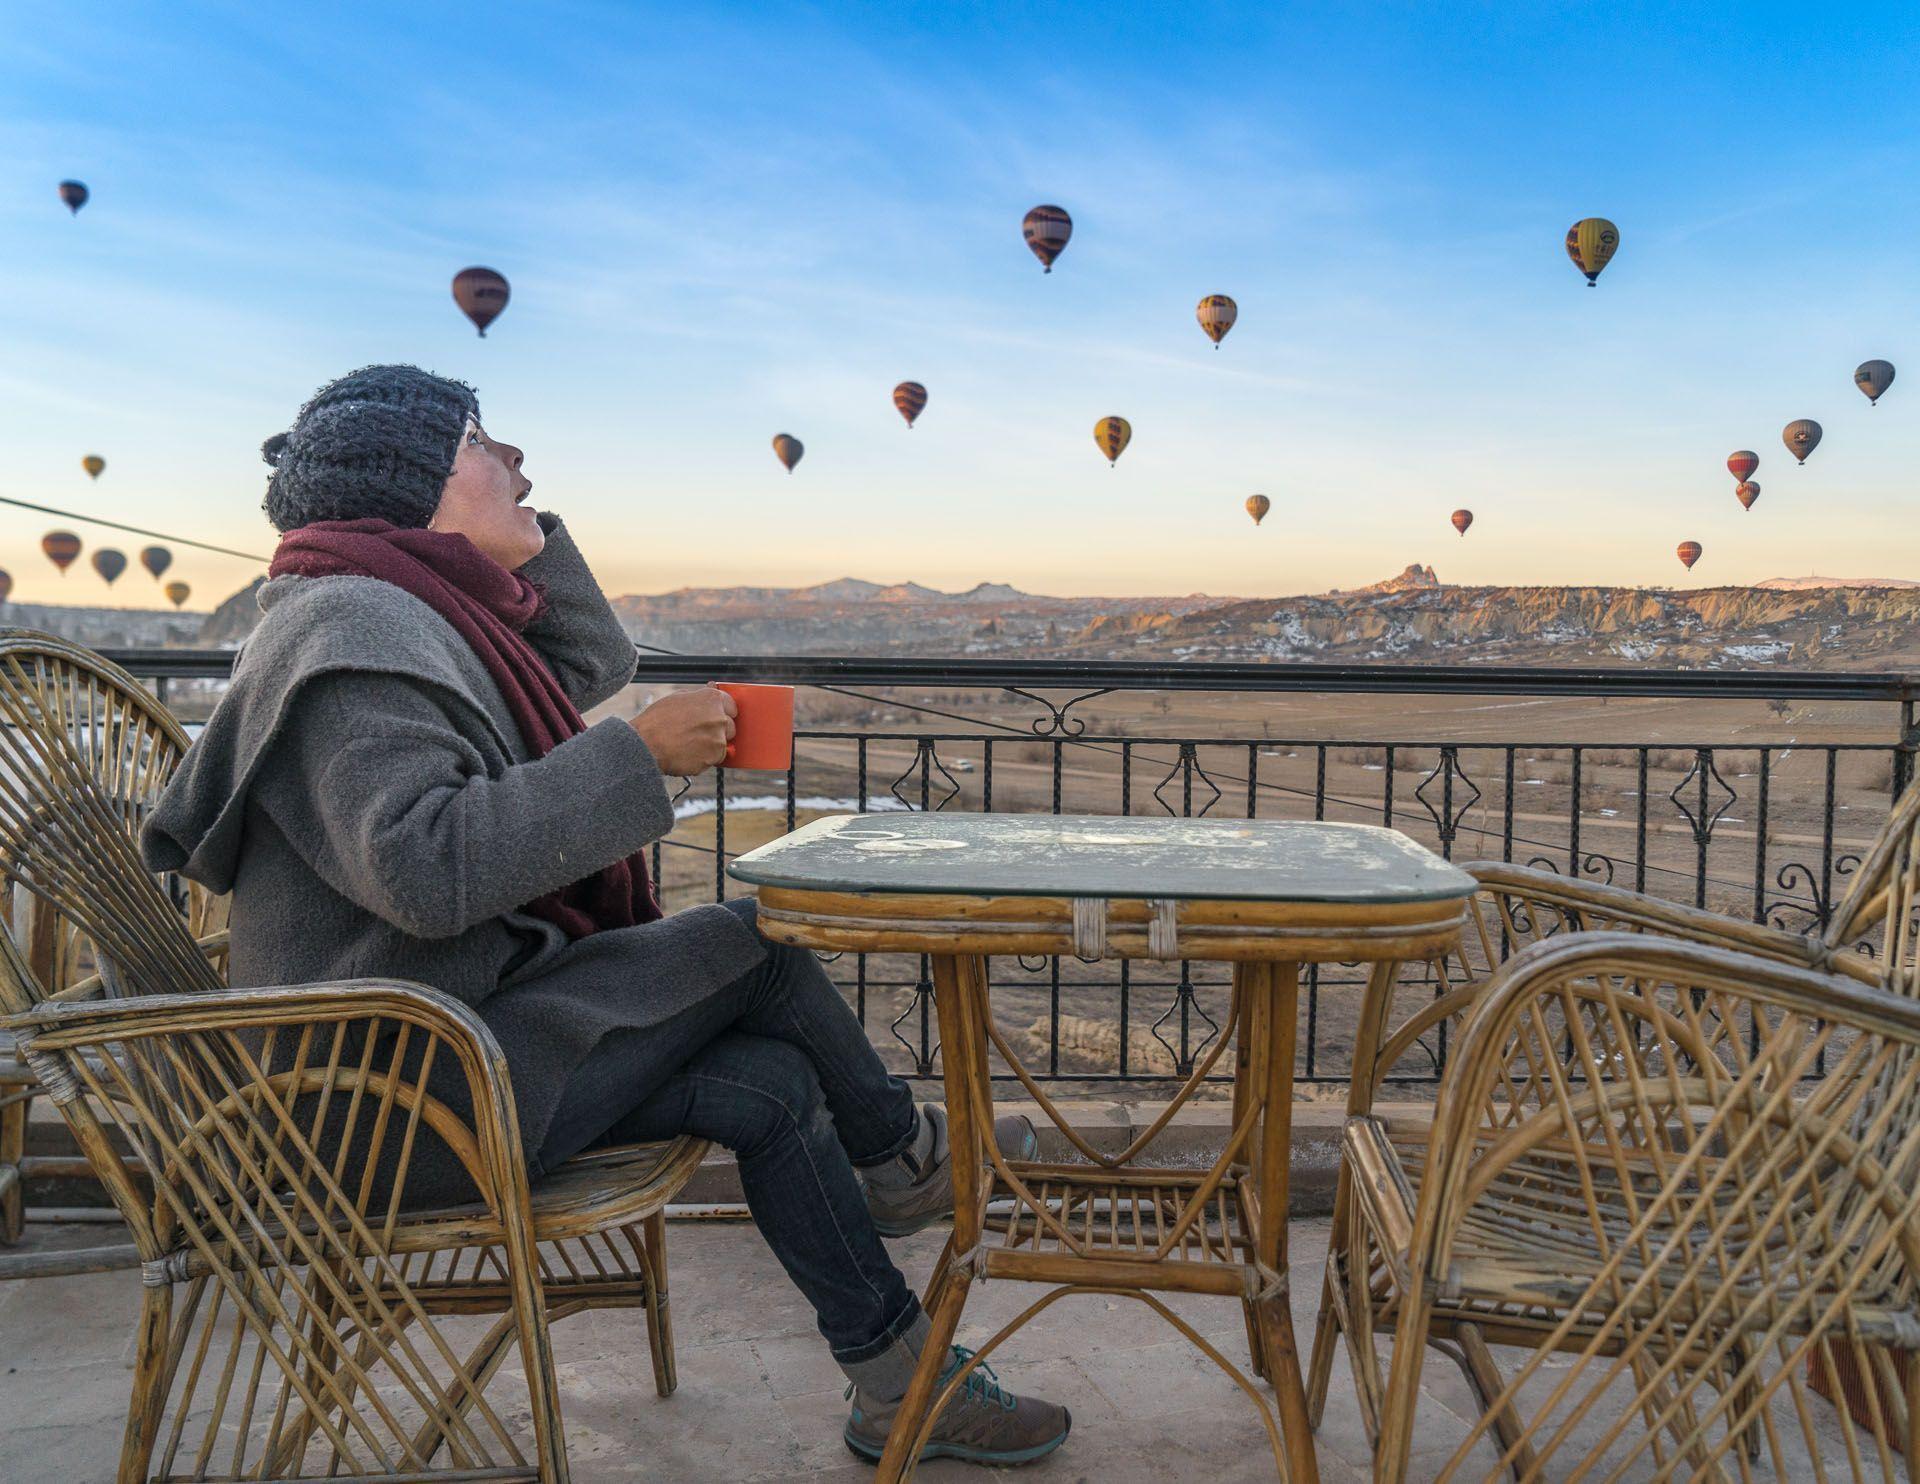 Lesvoyageuses-voyage-en-turquie-itineraire-cappadoce-9